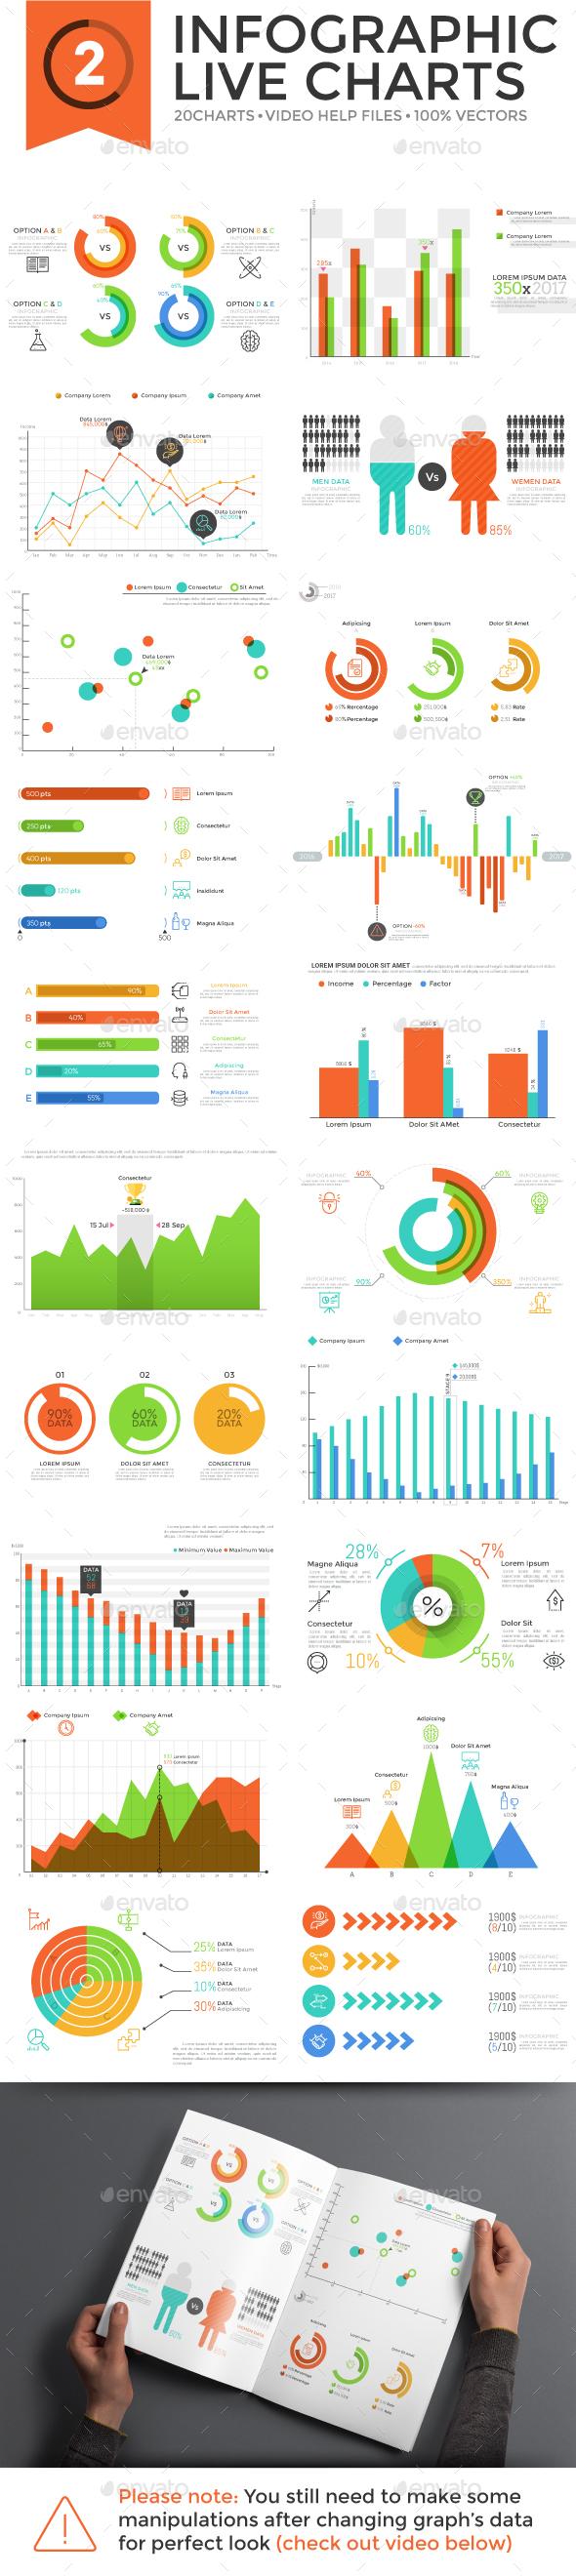 Edit Infographic Live Charts v.2